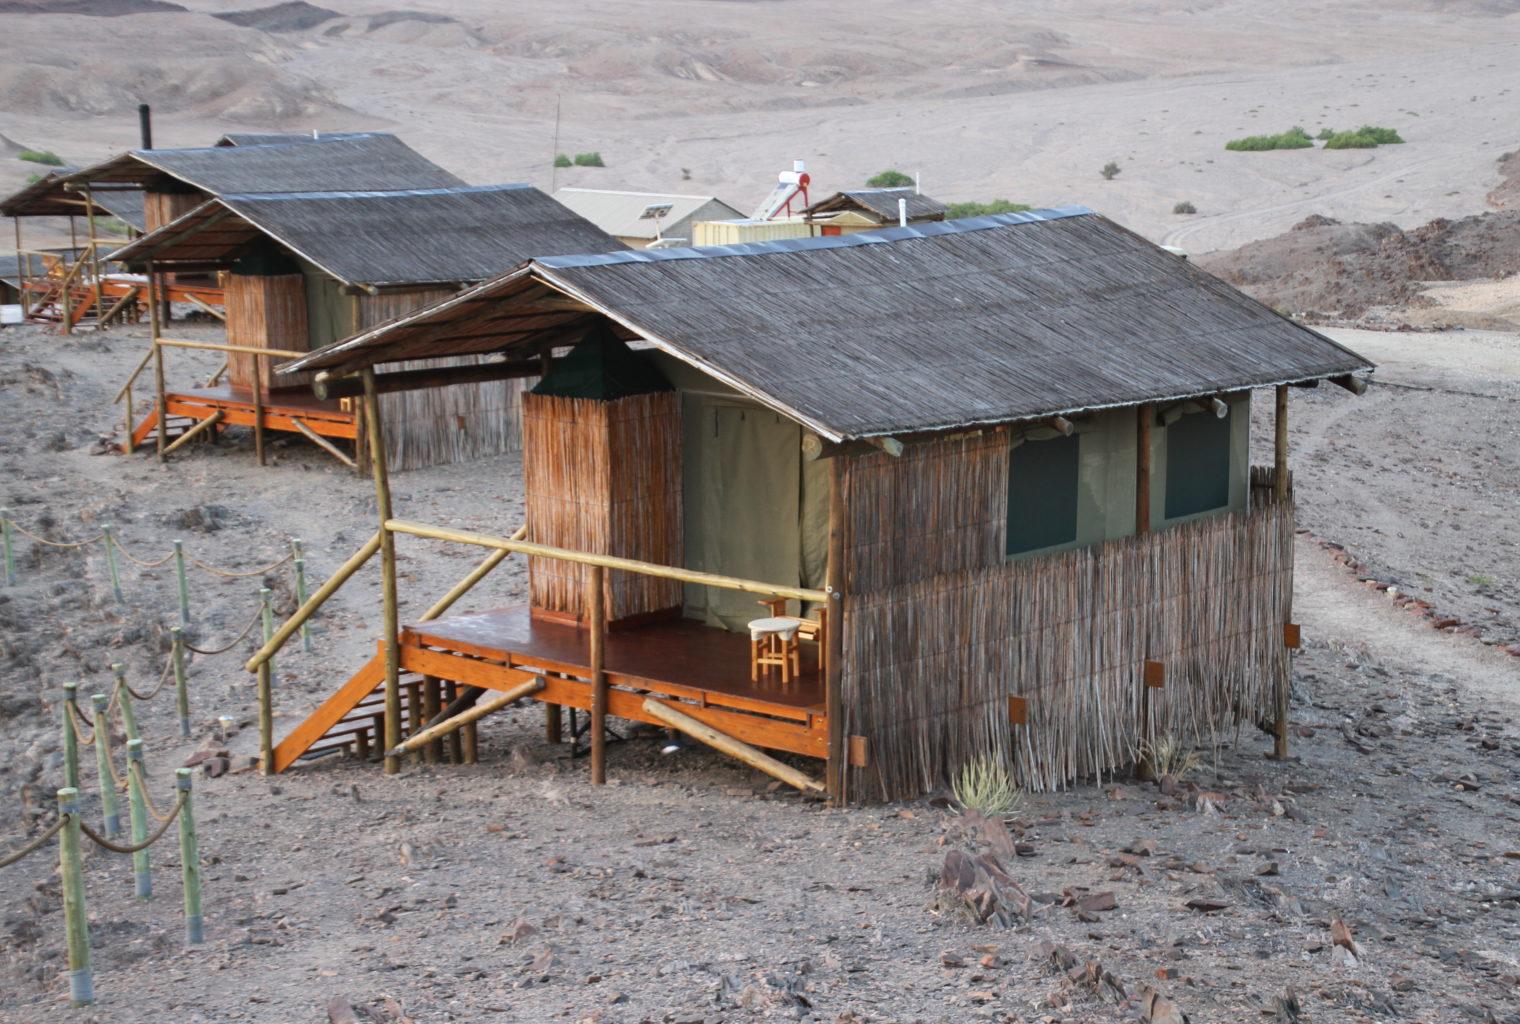 Leylandsdrift Camp Namibia Exterior